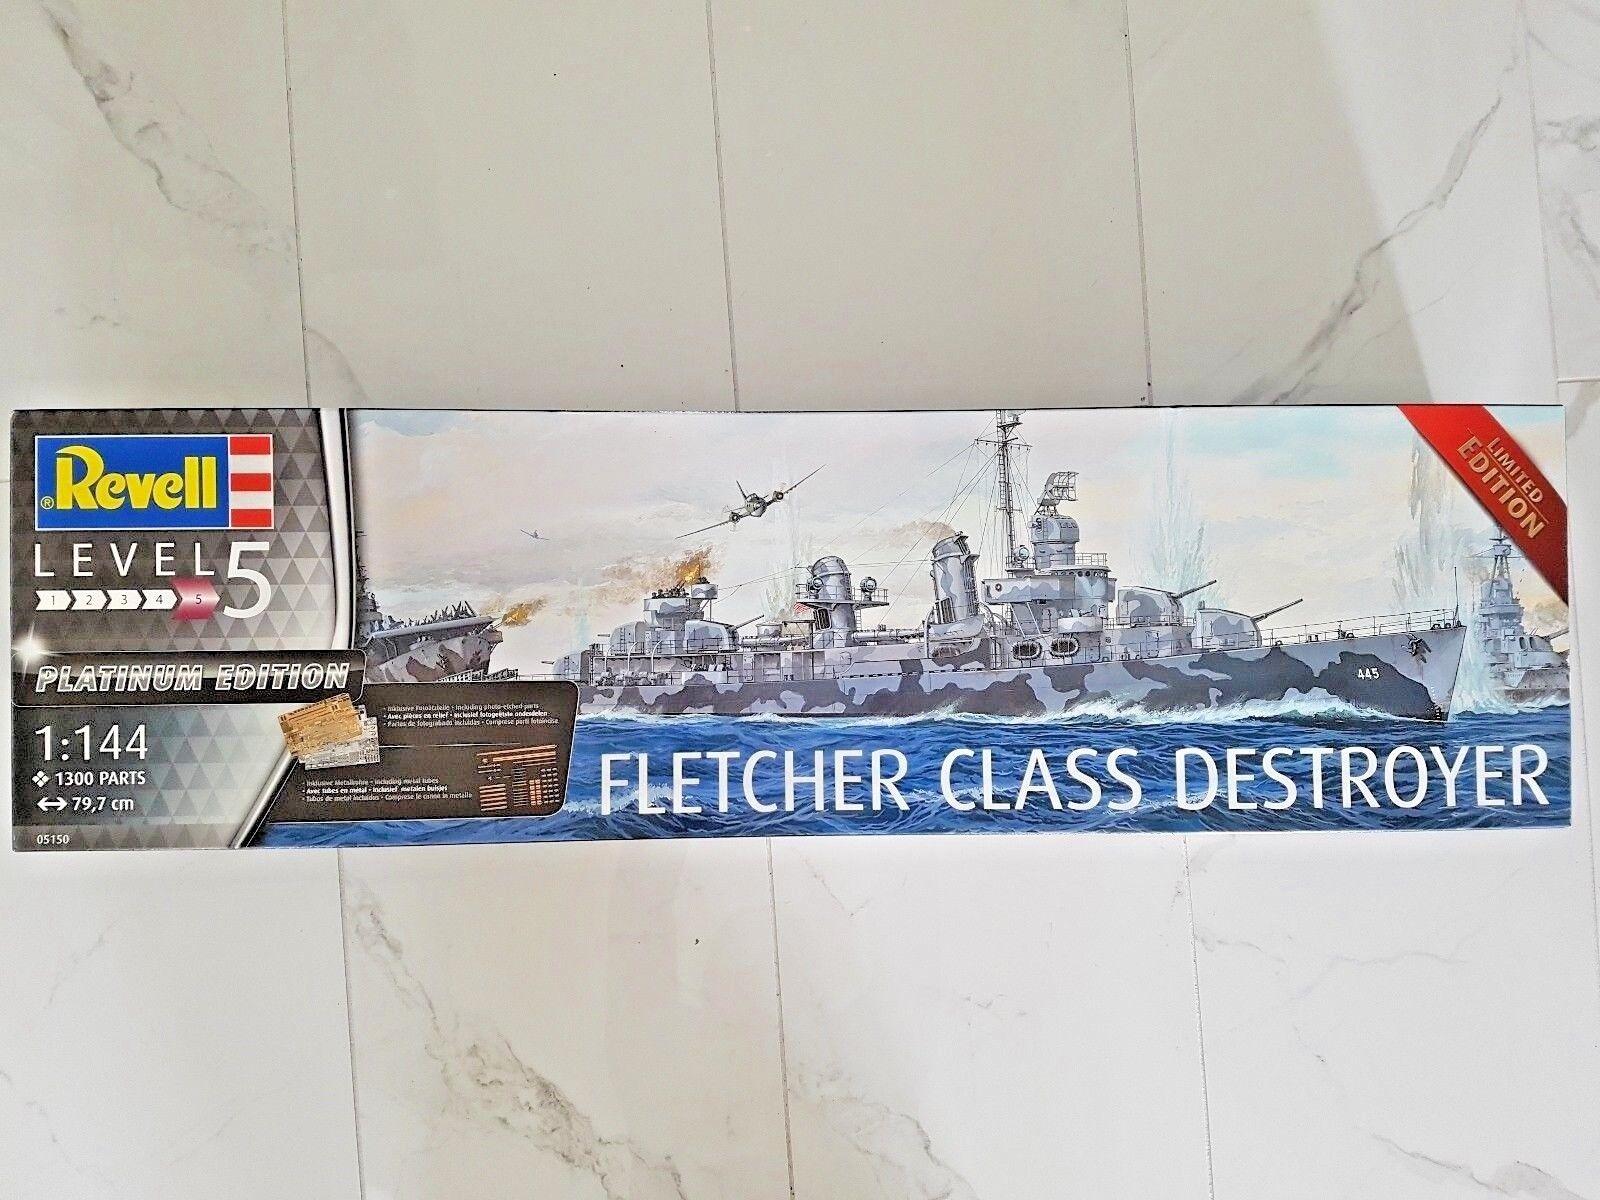 REVELL 1 144 PLATINUM LTD EDIT WW II US NAVY FLETCHER CLASS DESTROYER 05150 F S